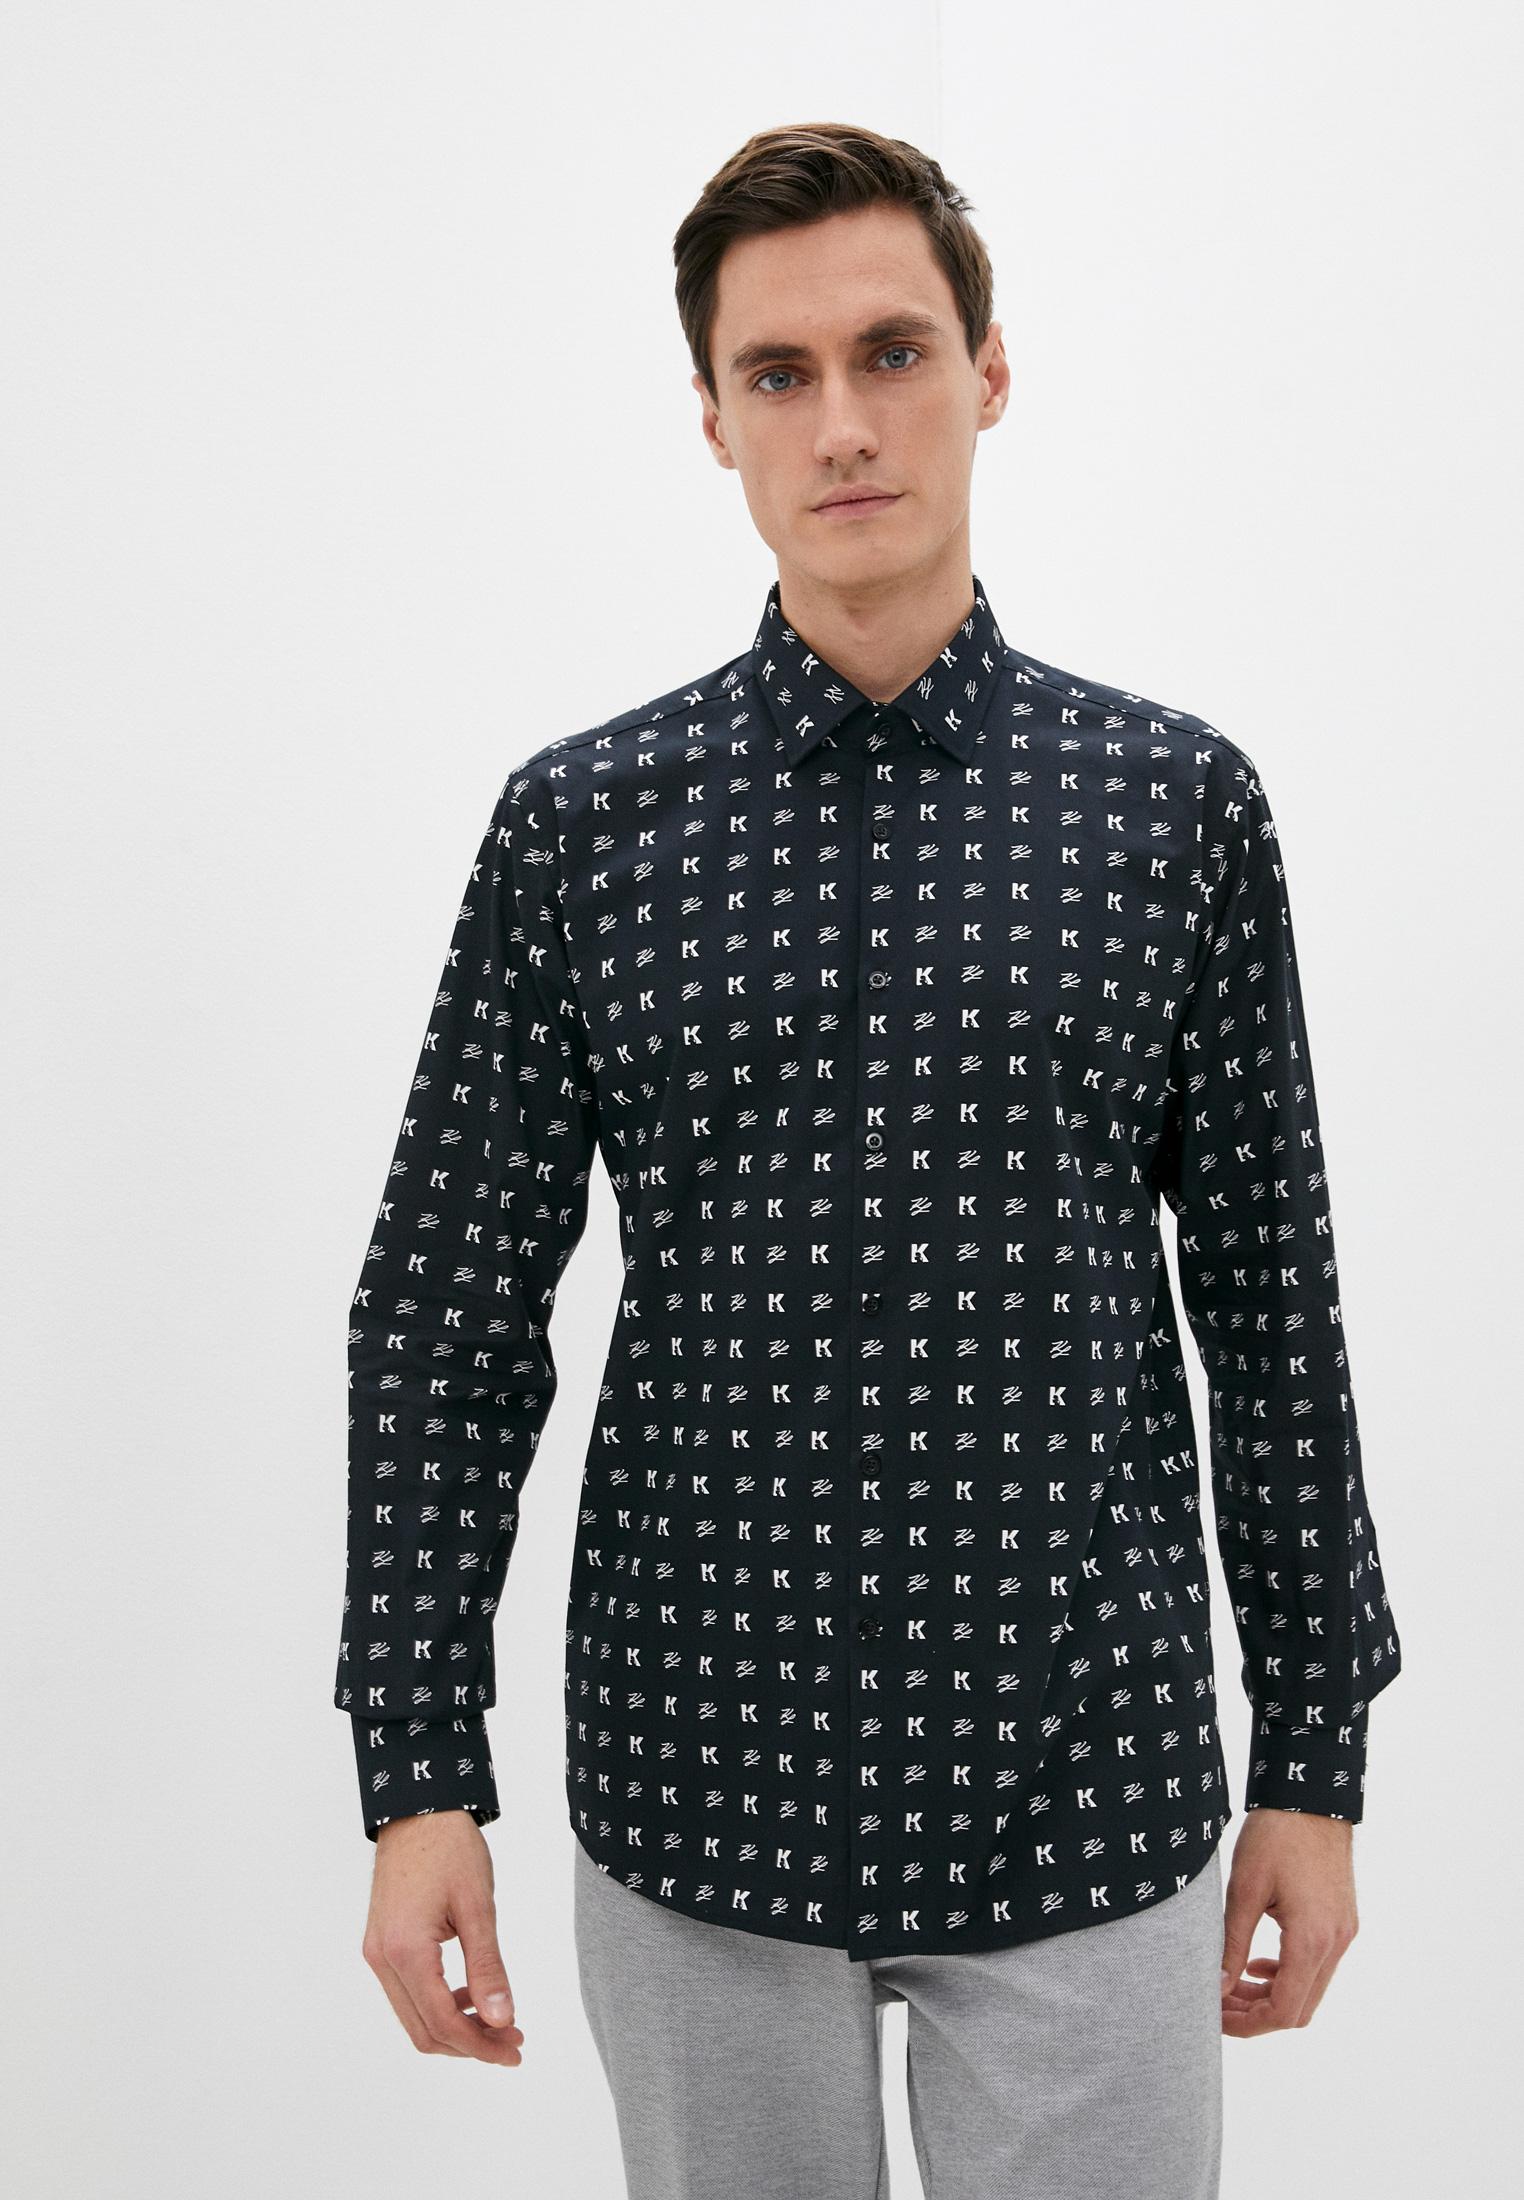 Рубашка с длинным рукавом Karl Lagerfeld (Карл Лагерфельд) 512606-605003